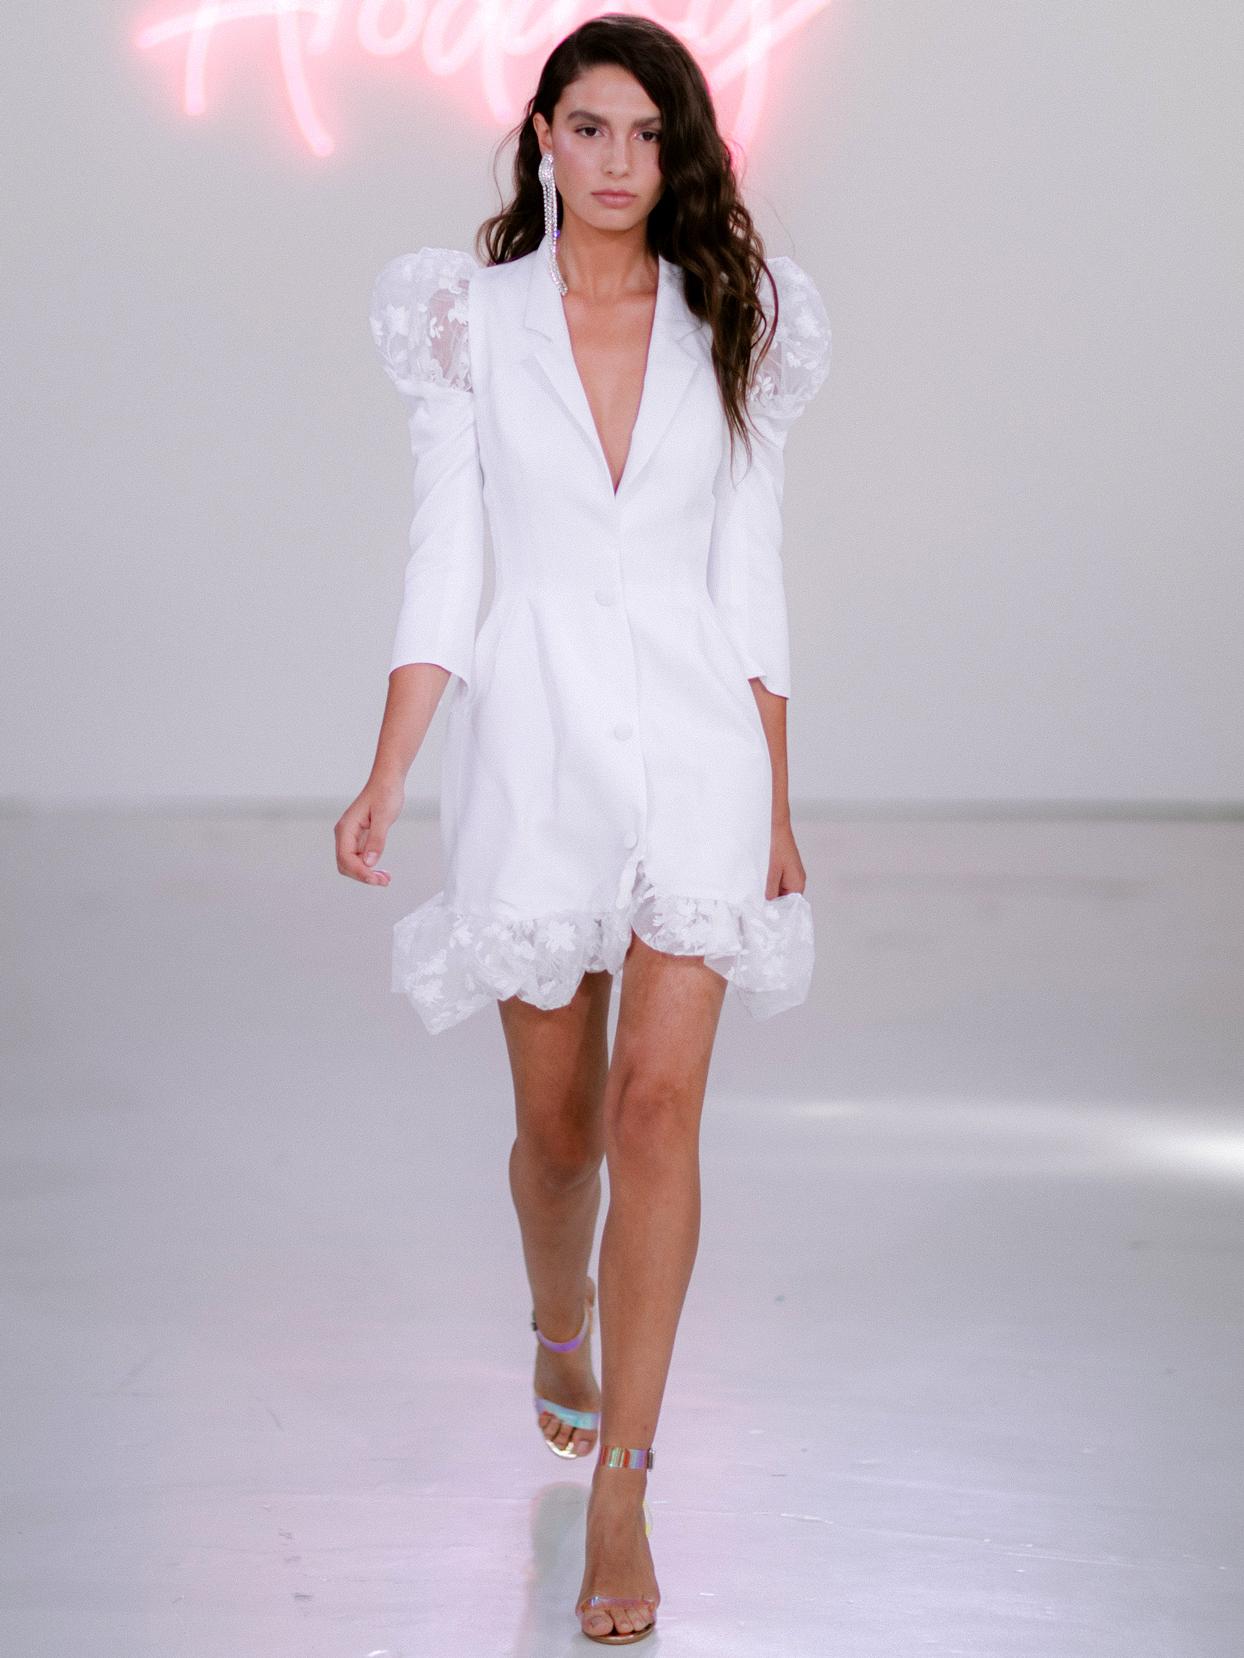 Rime Arodaky X The Mews Bridal button up mini three-quarter sleeves wedding dress fall 2020